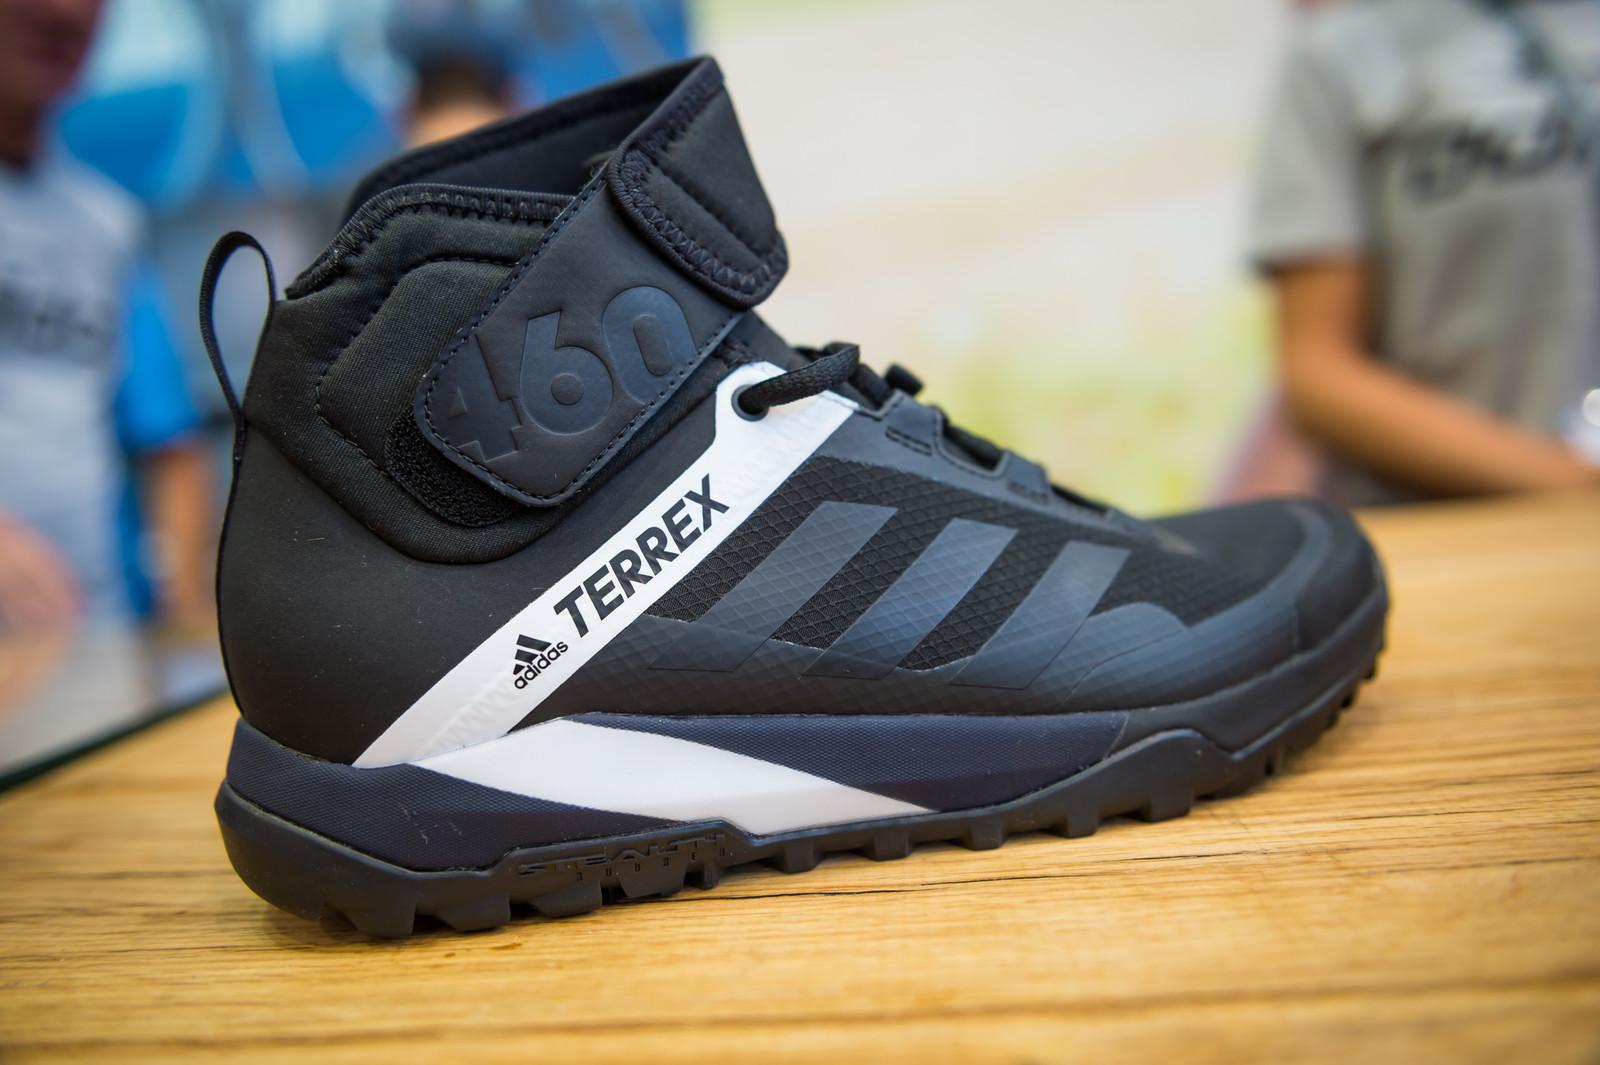 Adidas Terrex Trailcross Protect Shoe - EUROBIKE - 2017 Mountain Bike Apparel and Protective Gear - Mountain Biking Pictures - Vital MTB